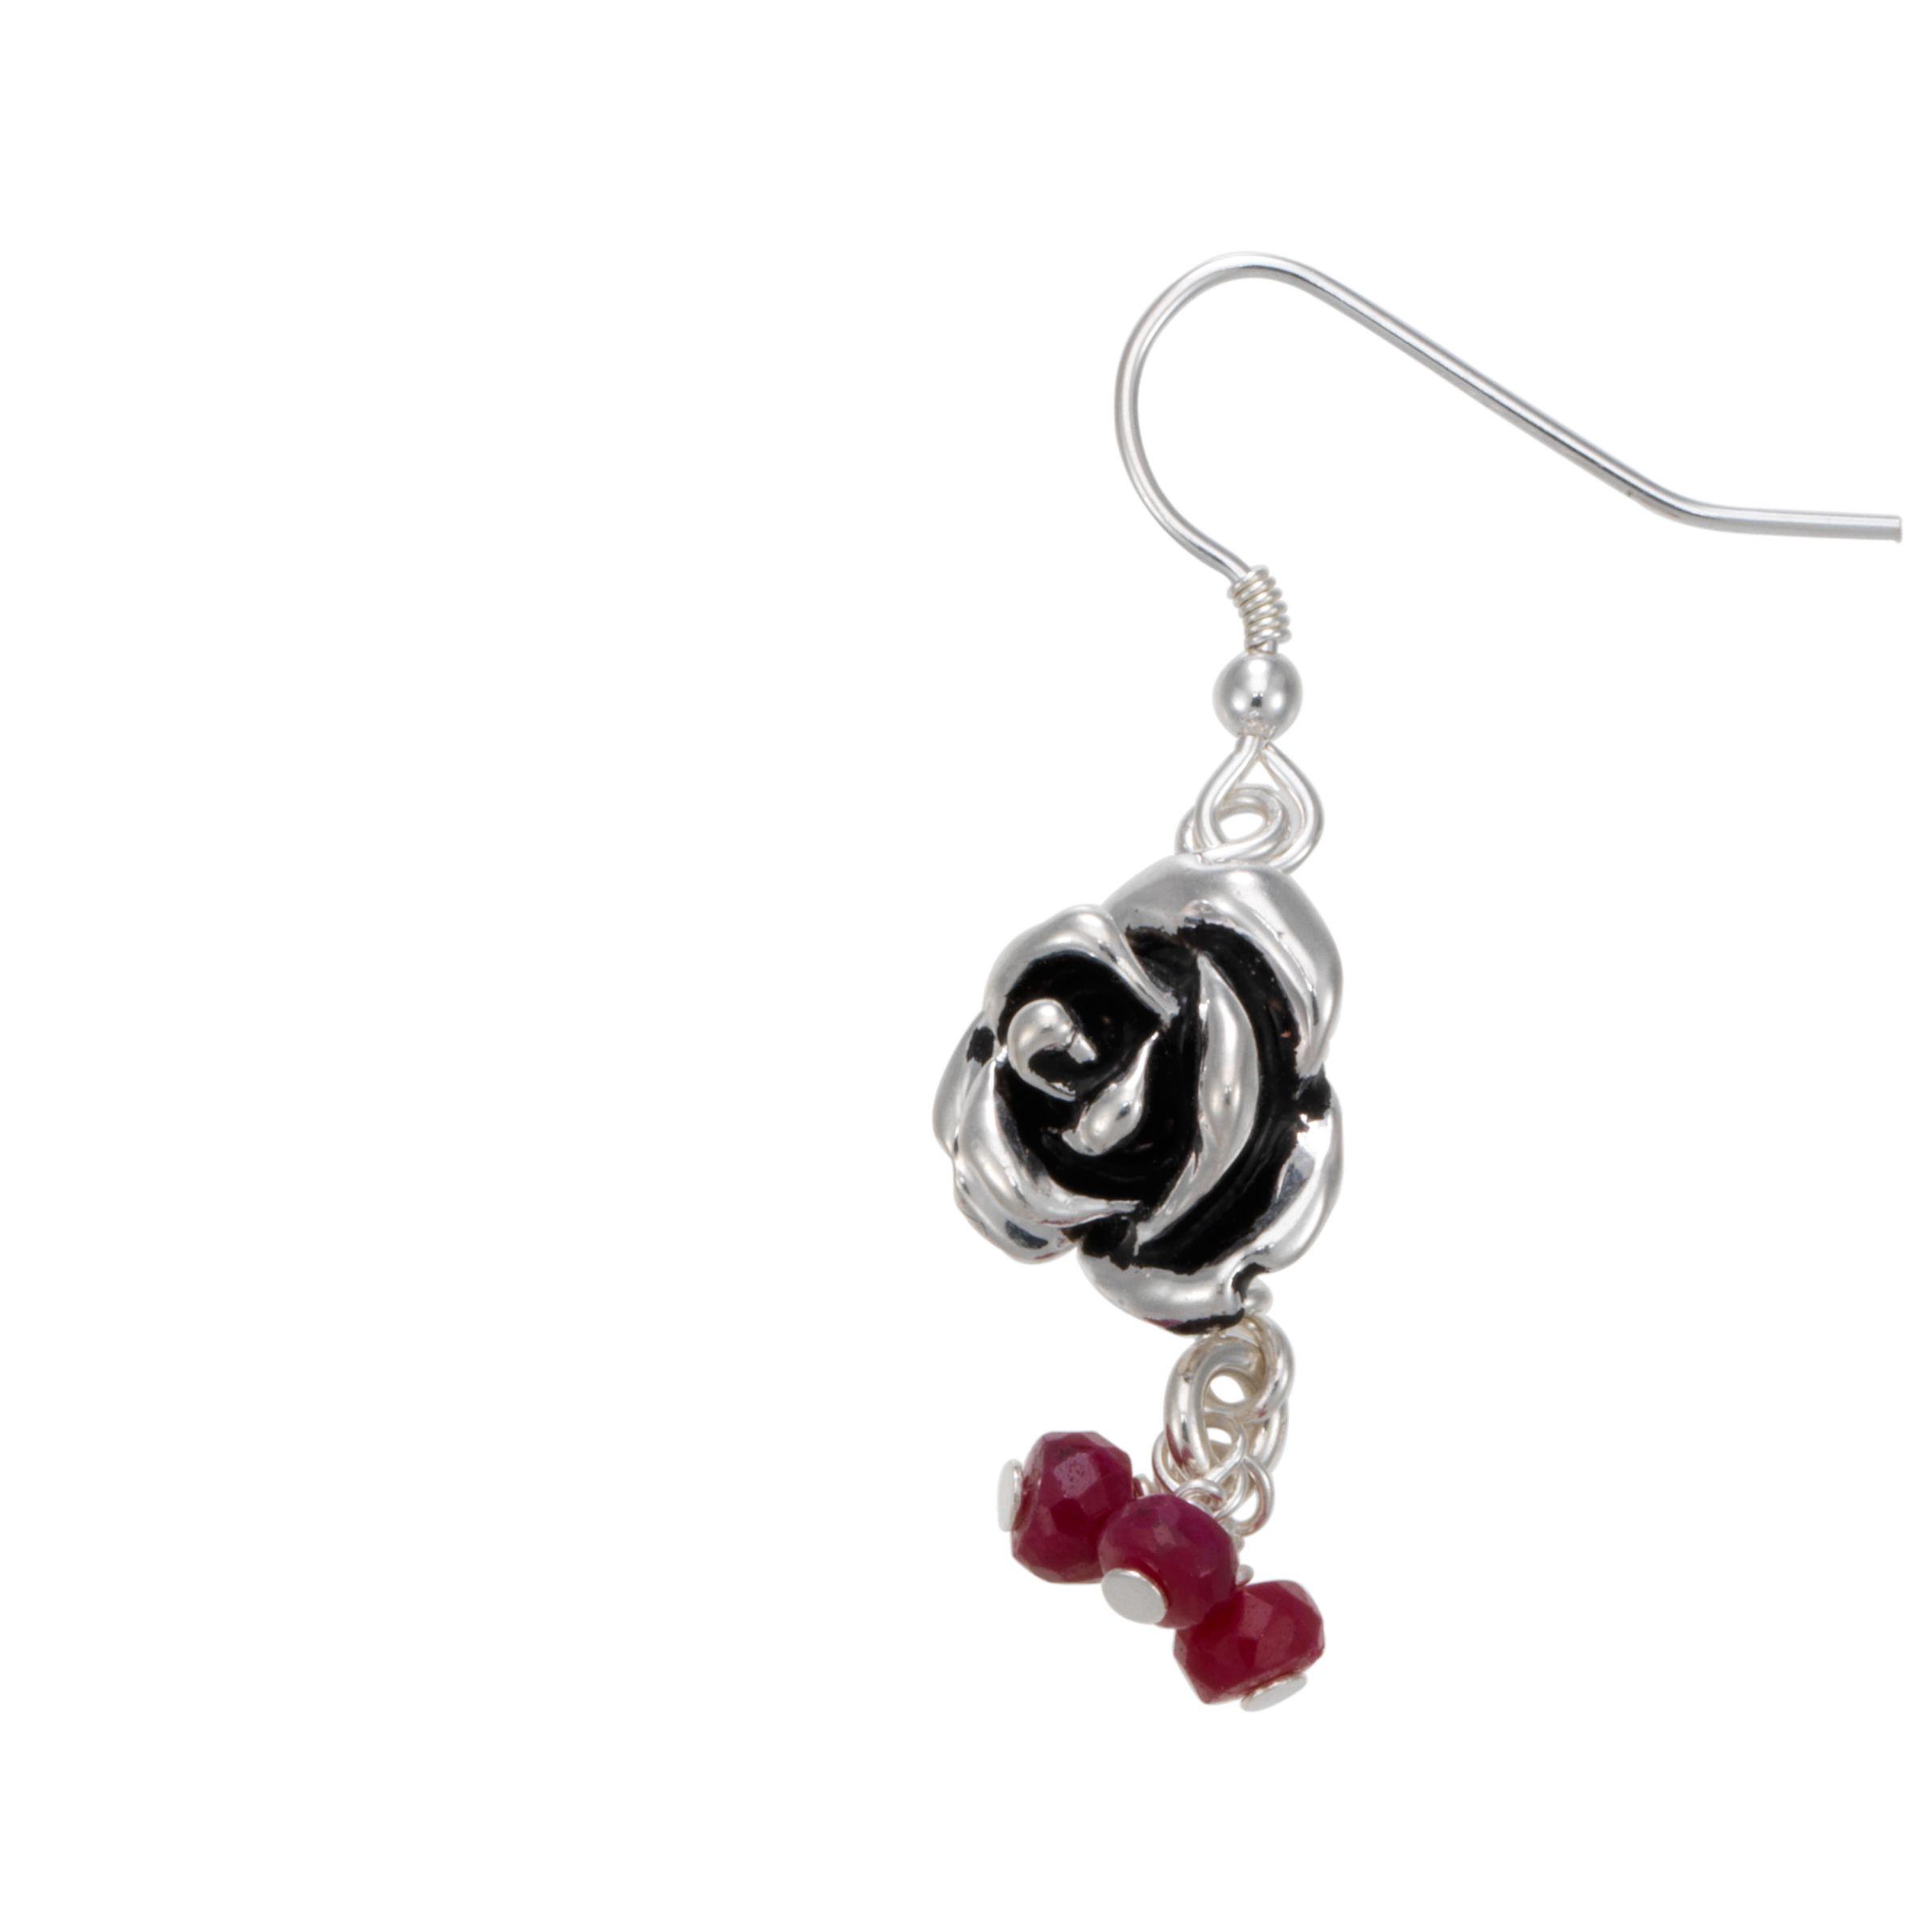 Martick Ruby Rose Earrings